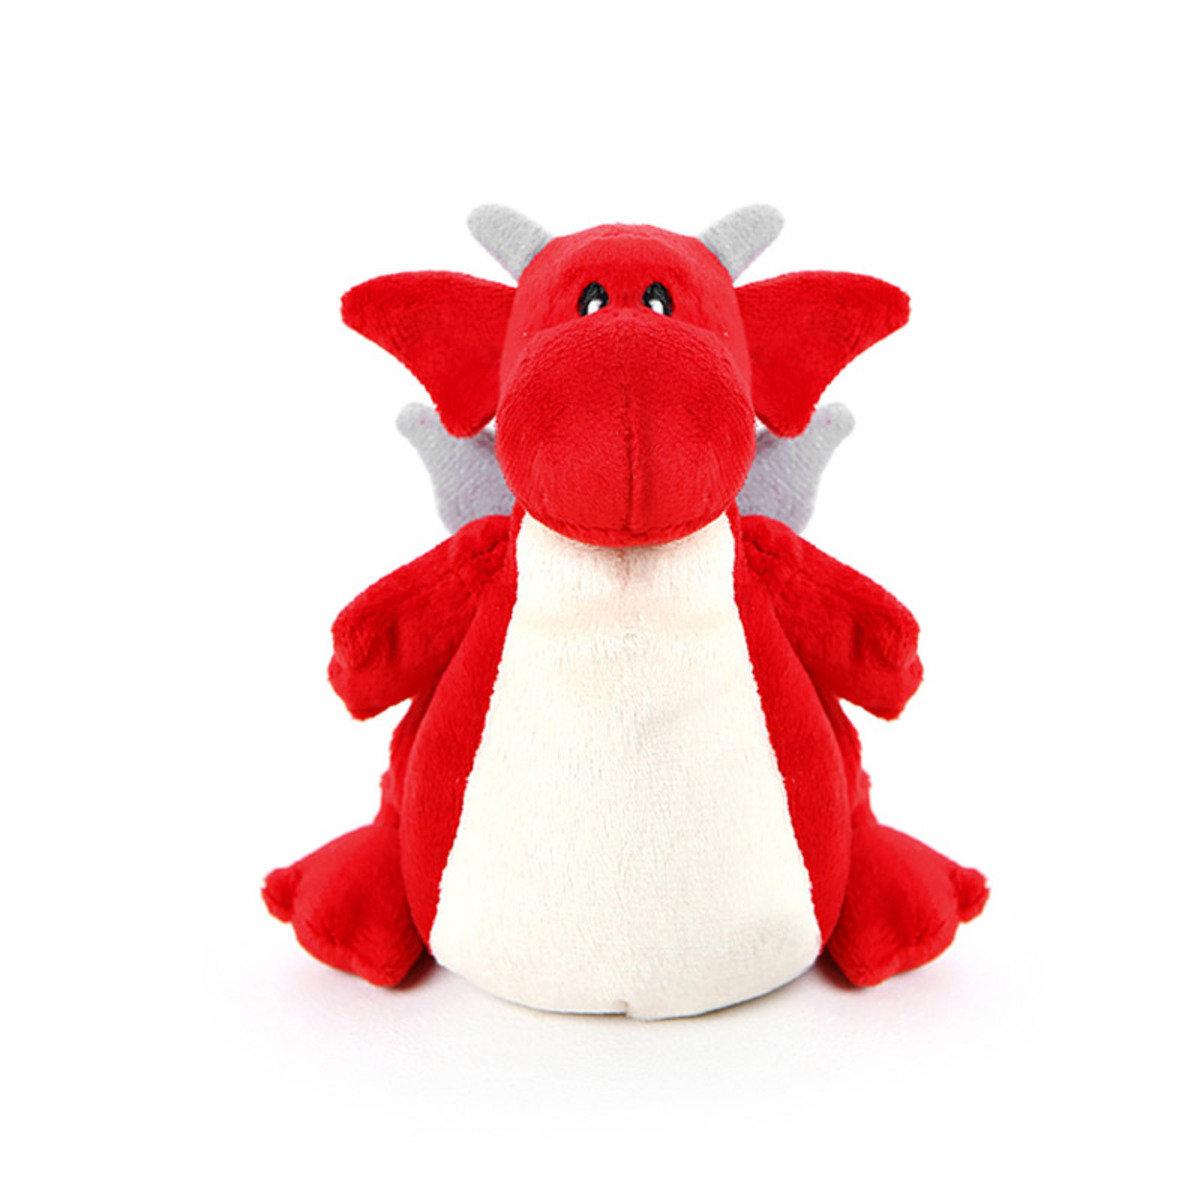 暖包公仔_ Dragon_紅色